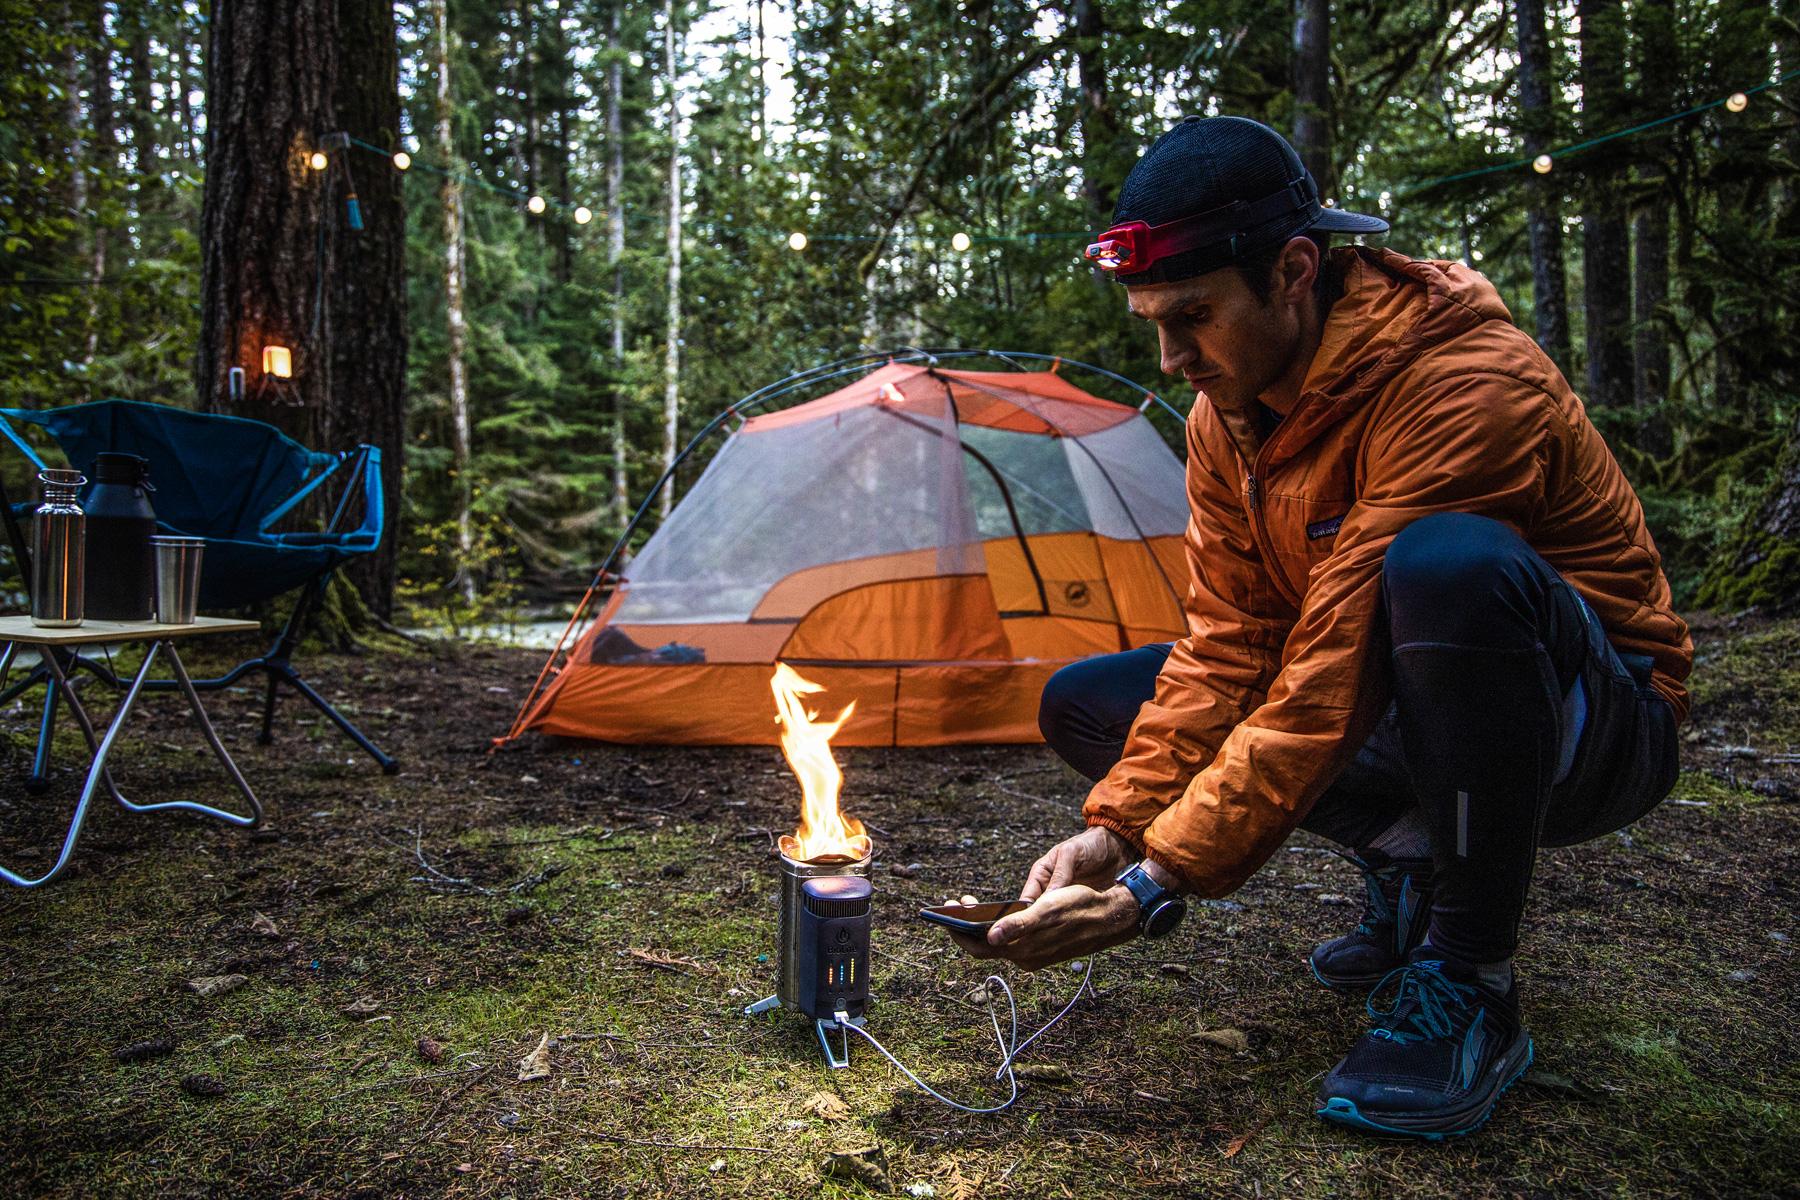 Climate Neutral BioLite CampStove 2